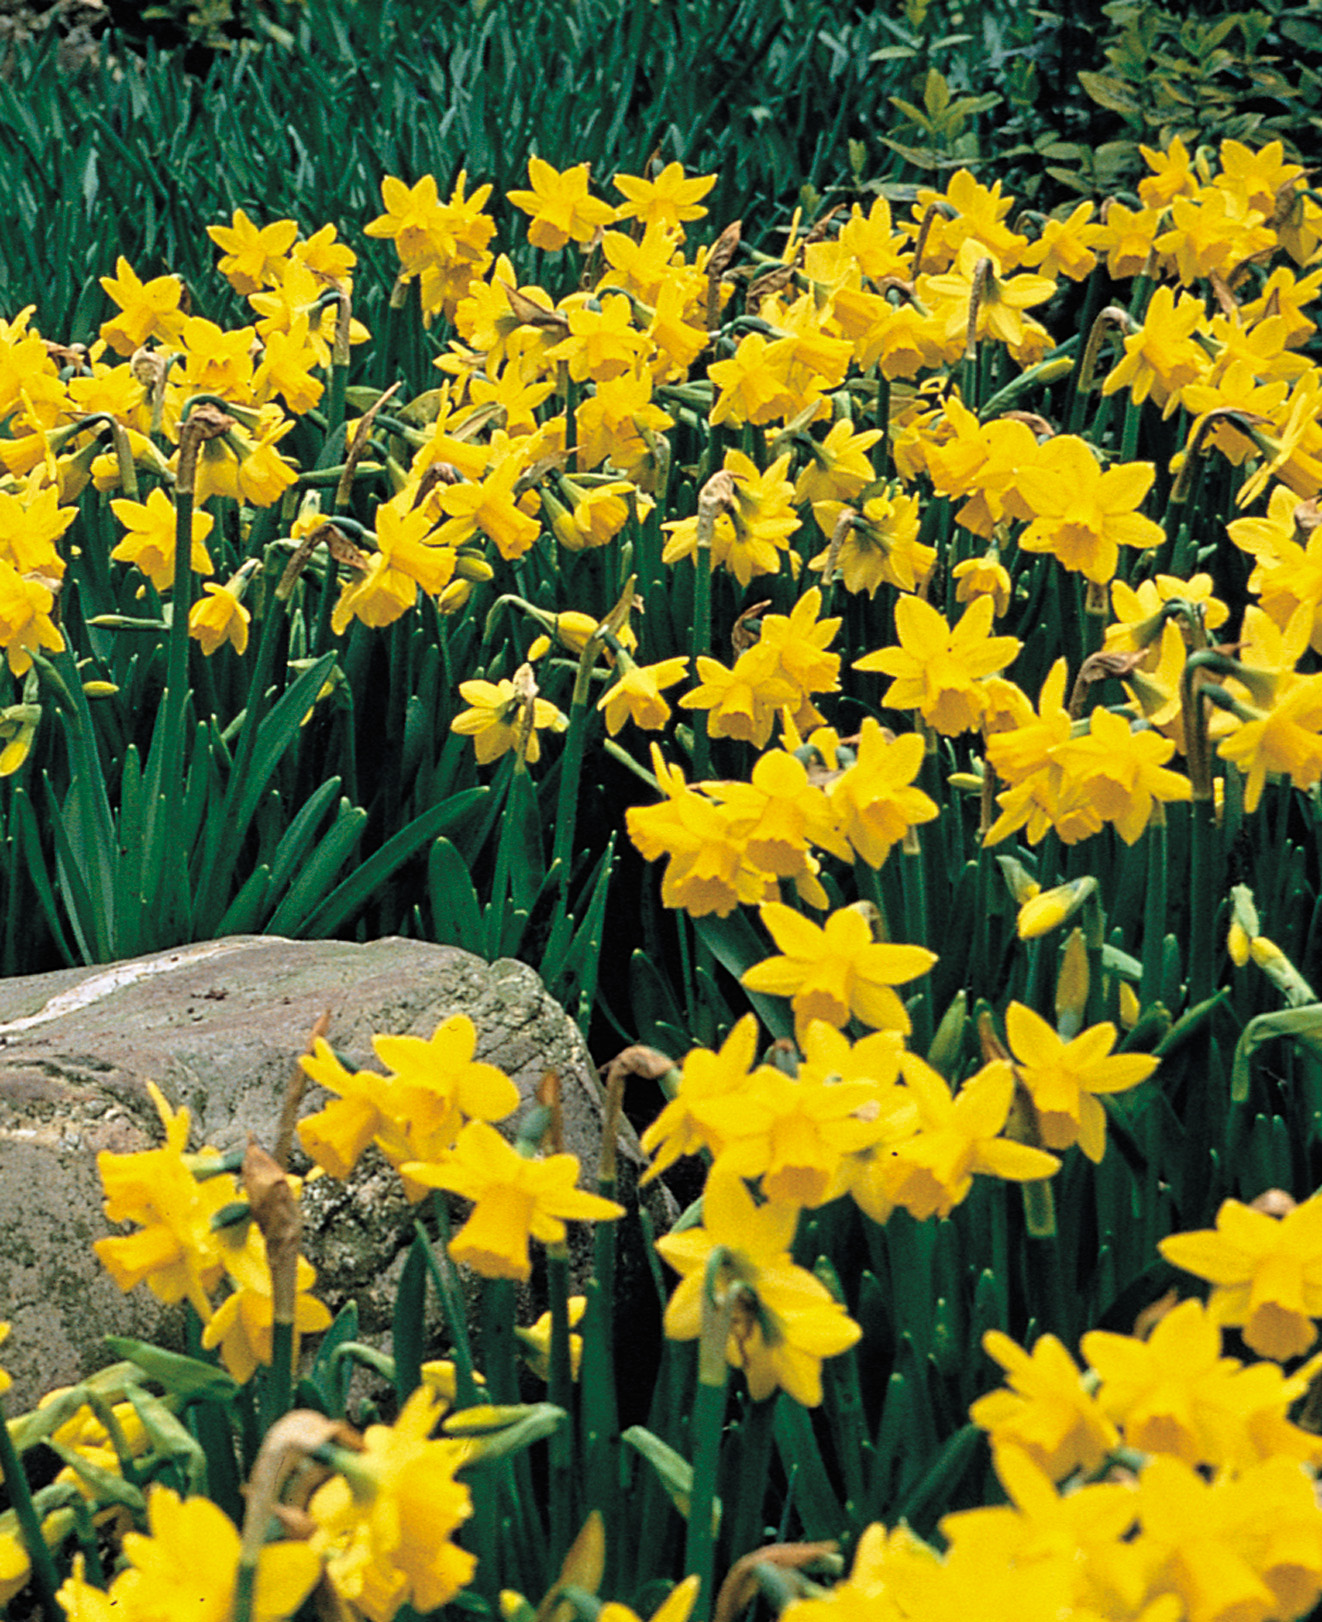 daffodil - photo #7